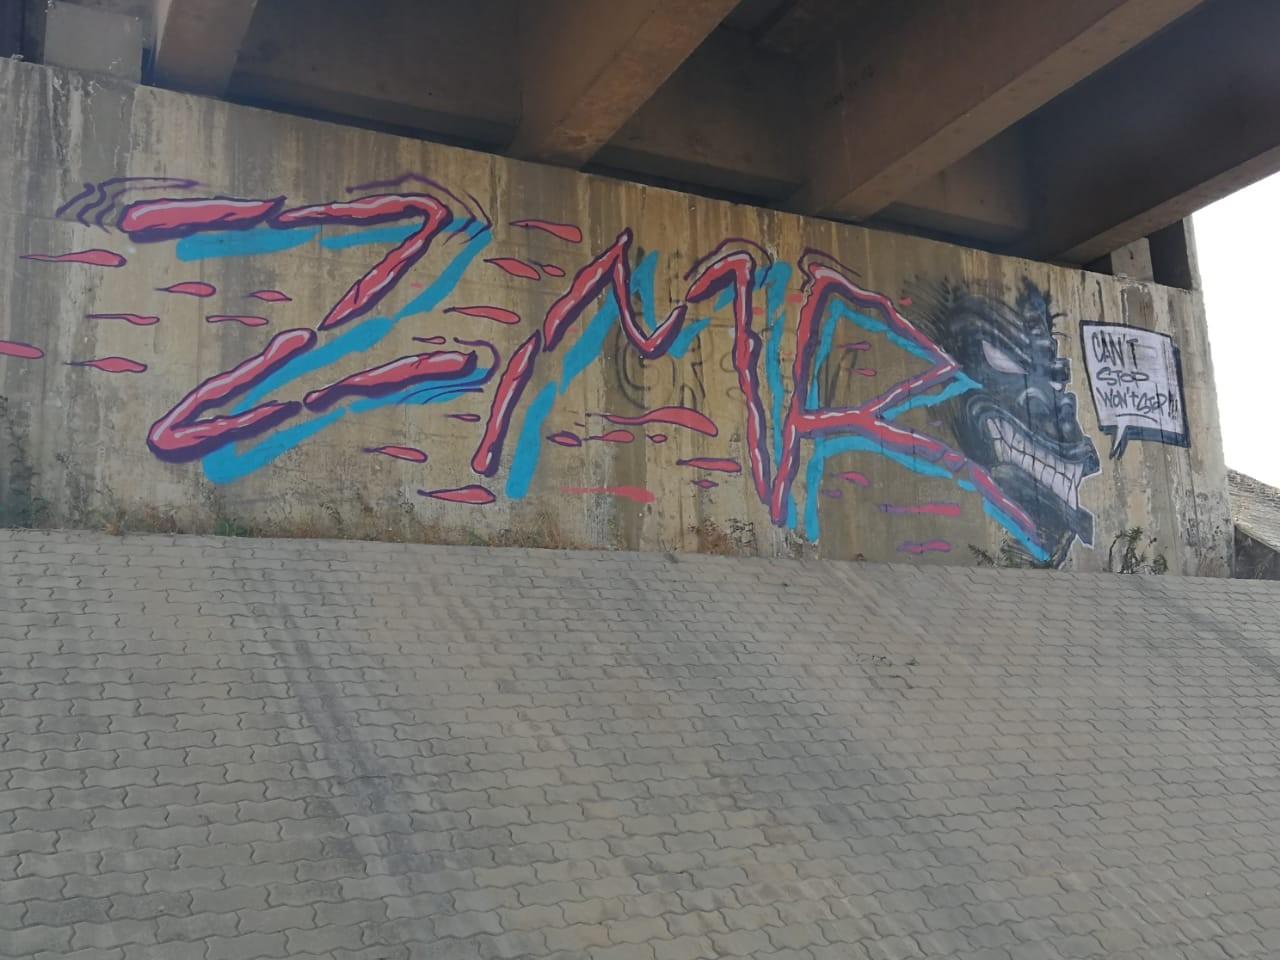 ZMR, crew, graffiti, Maroc, vandal, illégal, Casablanca